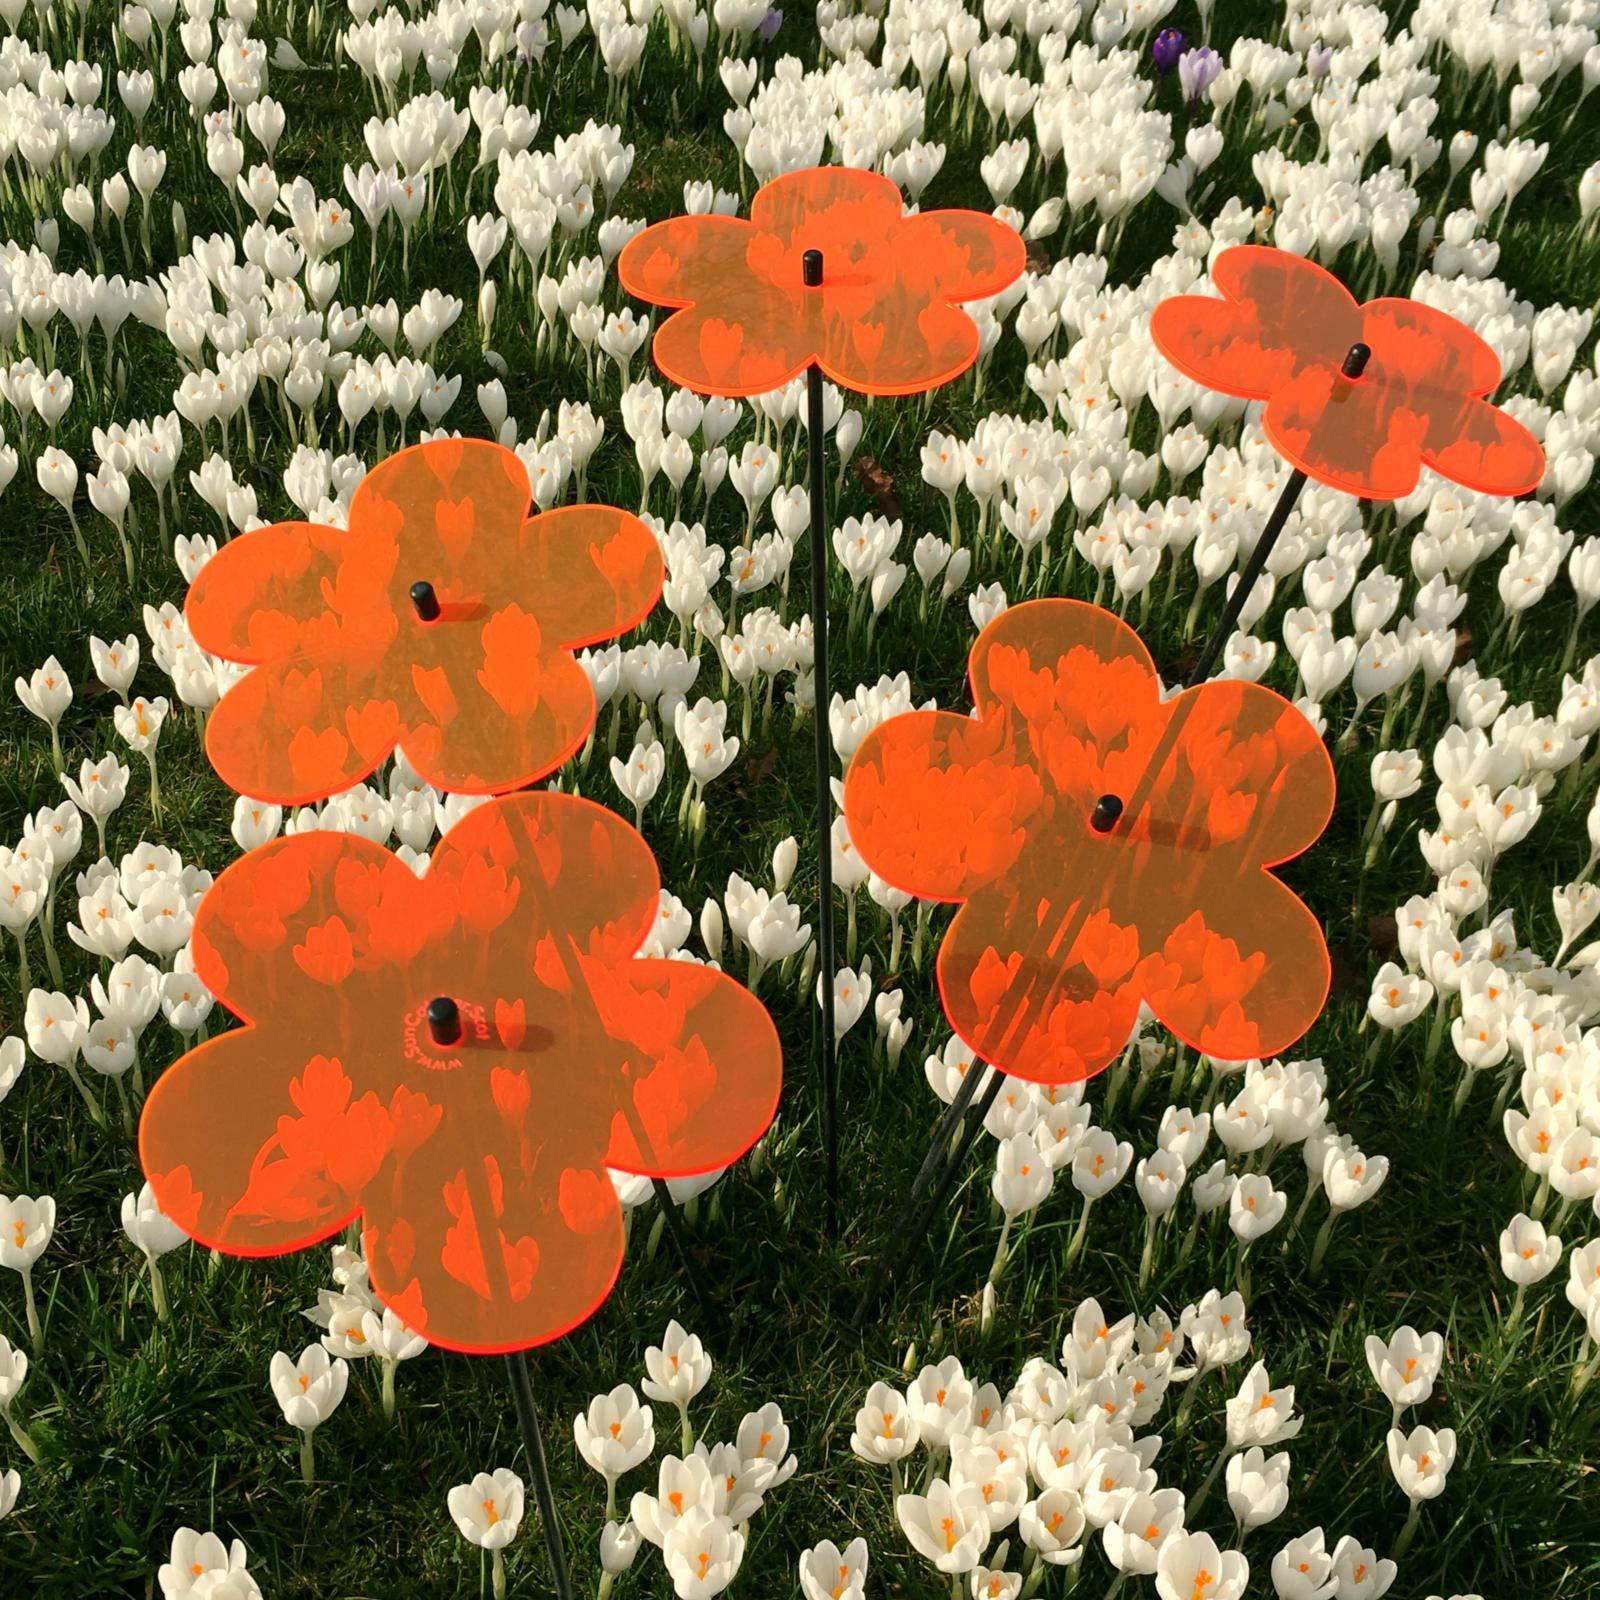 Suncatcher Set of 5: Blossom | 150mm / 5,9'' Ø Fluorescent Garden Ornament | Glowing Garden Decoration on Stick | Innovative Home Decor for Outdoor Garden Balcony Pathway Patio, Colour:Orange